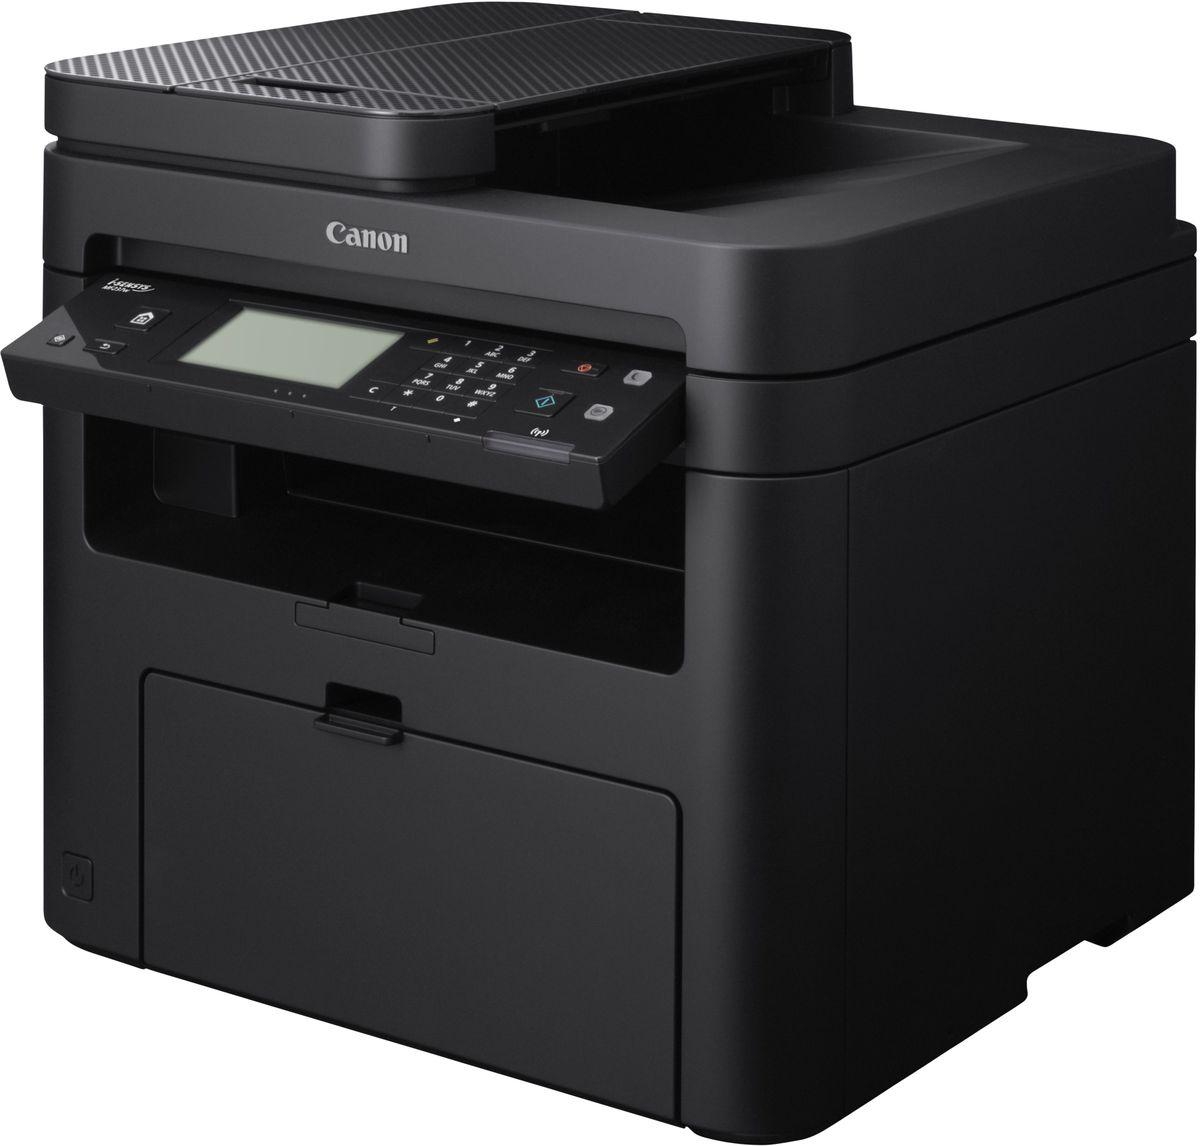 Canon I-SENSYS MF237w МФУ1418C121МФУ Canon I-SENSYS MF237w (копир-принтер-сканер, 23стр./мин., ADF, LAN, Wi-Fi, факс, A4) Замена MF216n